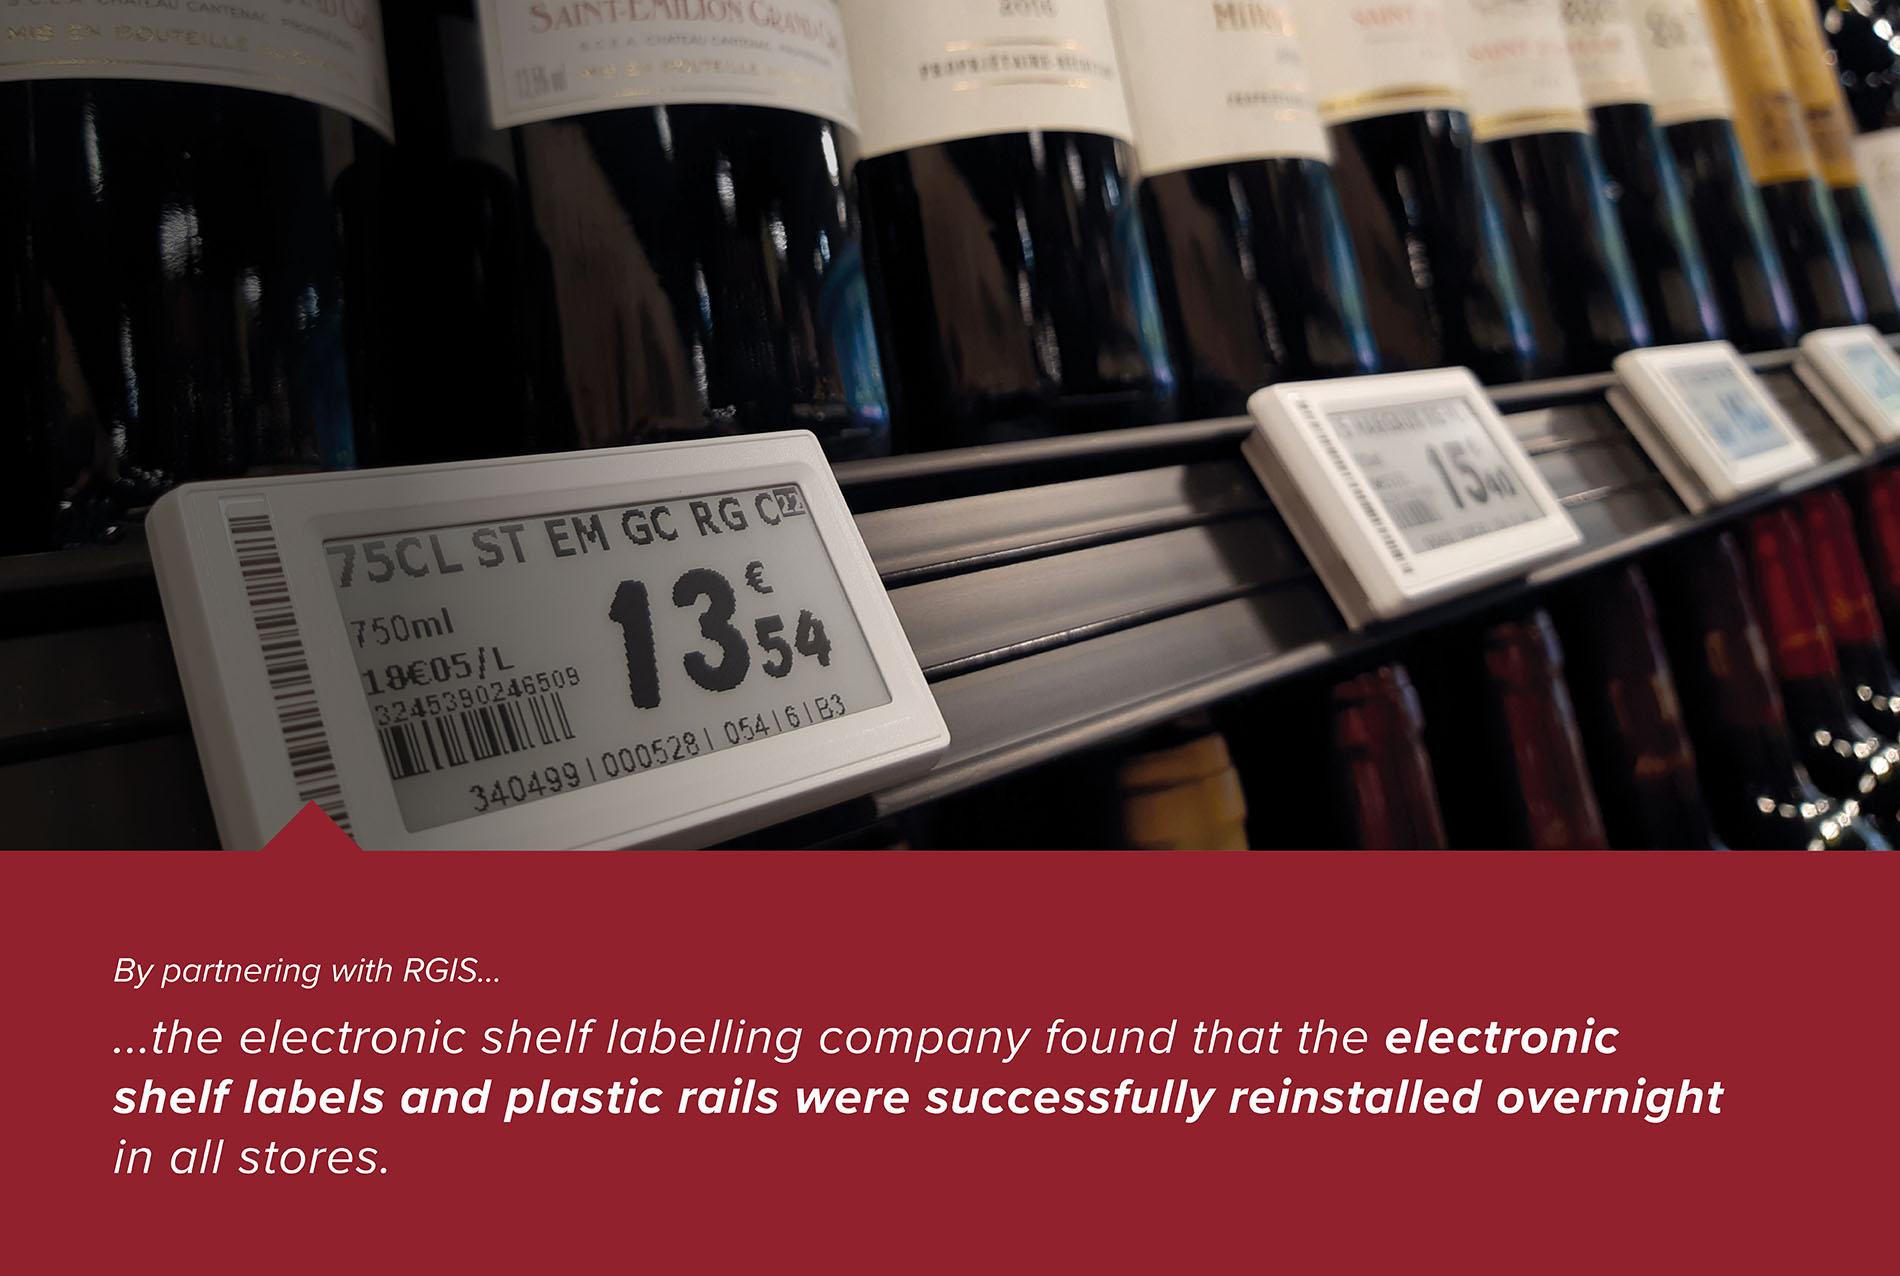 Electronic Shelf Labelling Reinstallation